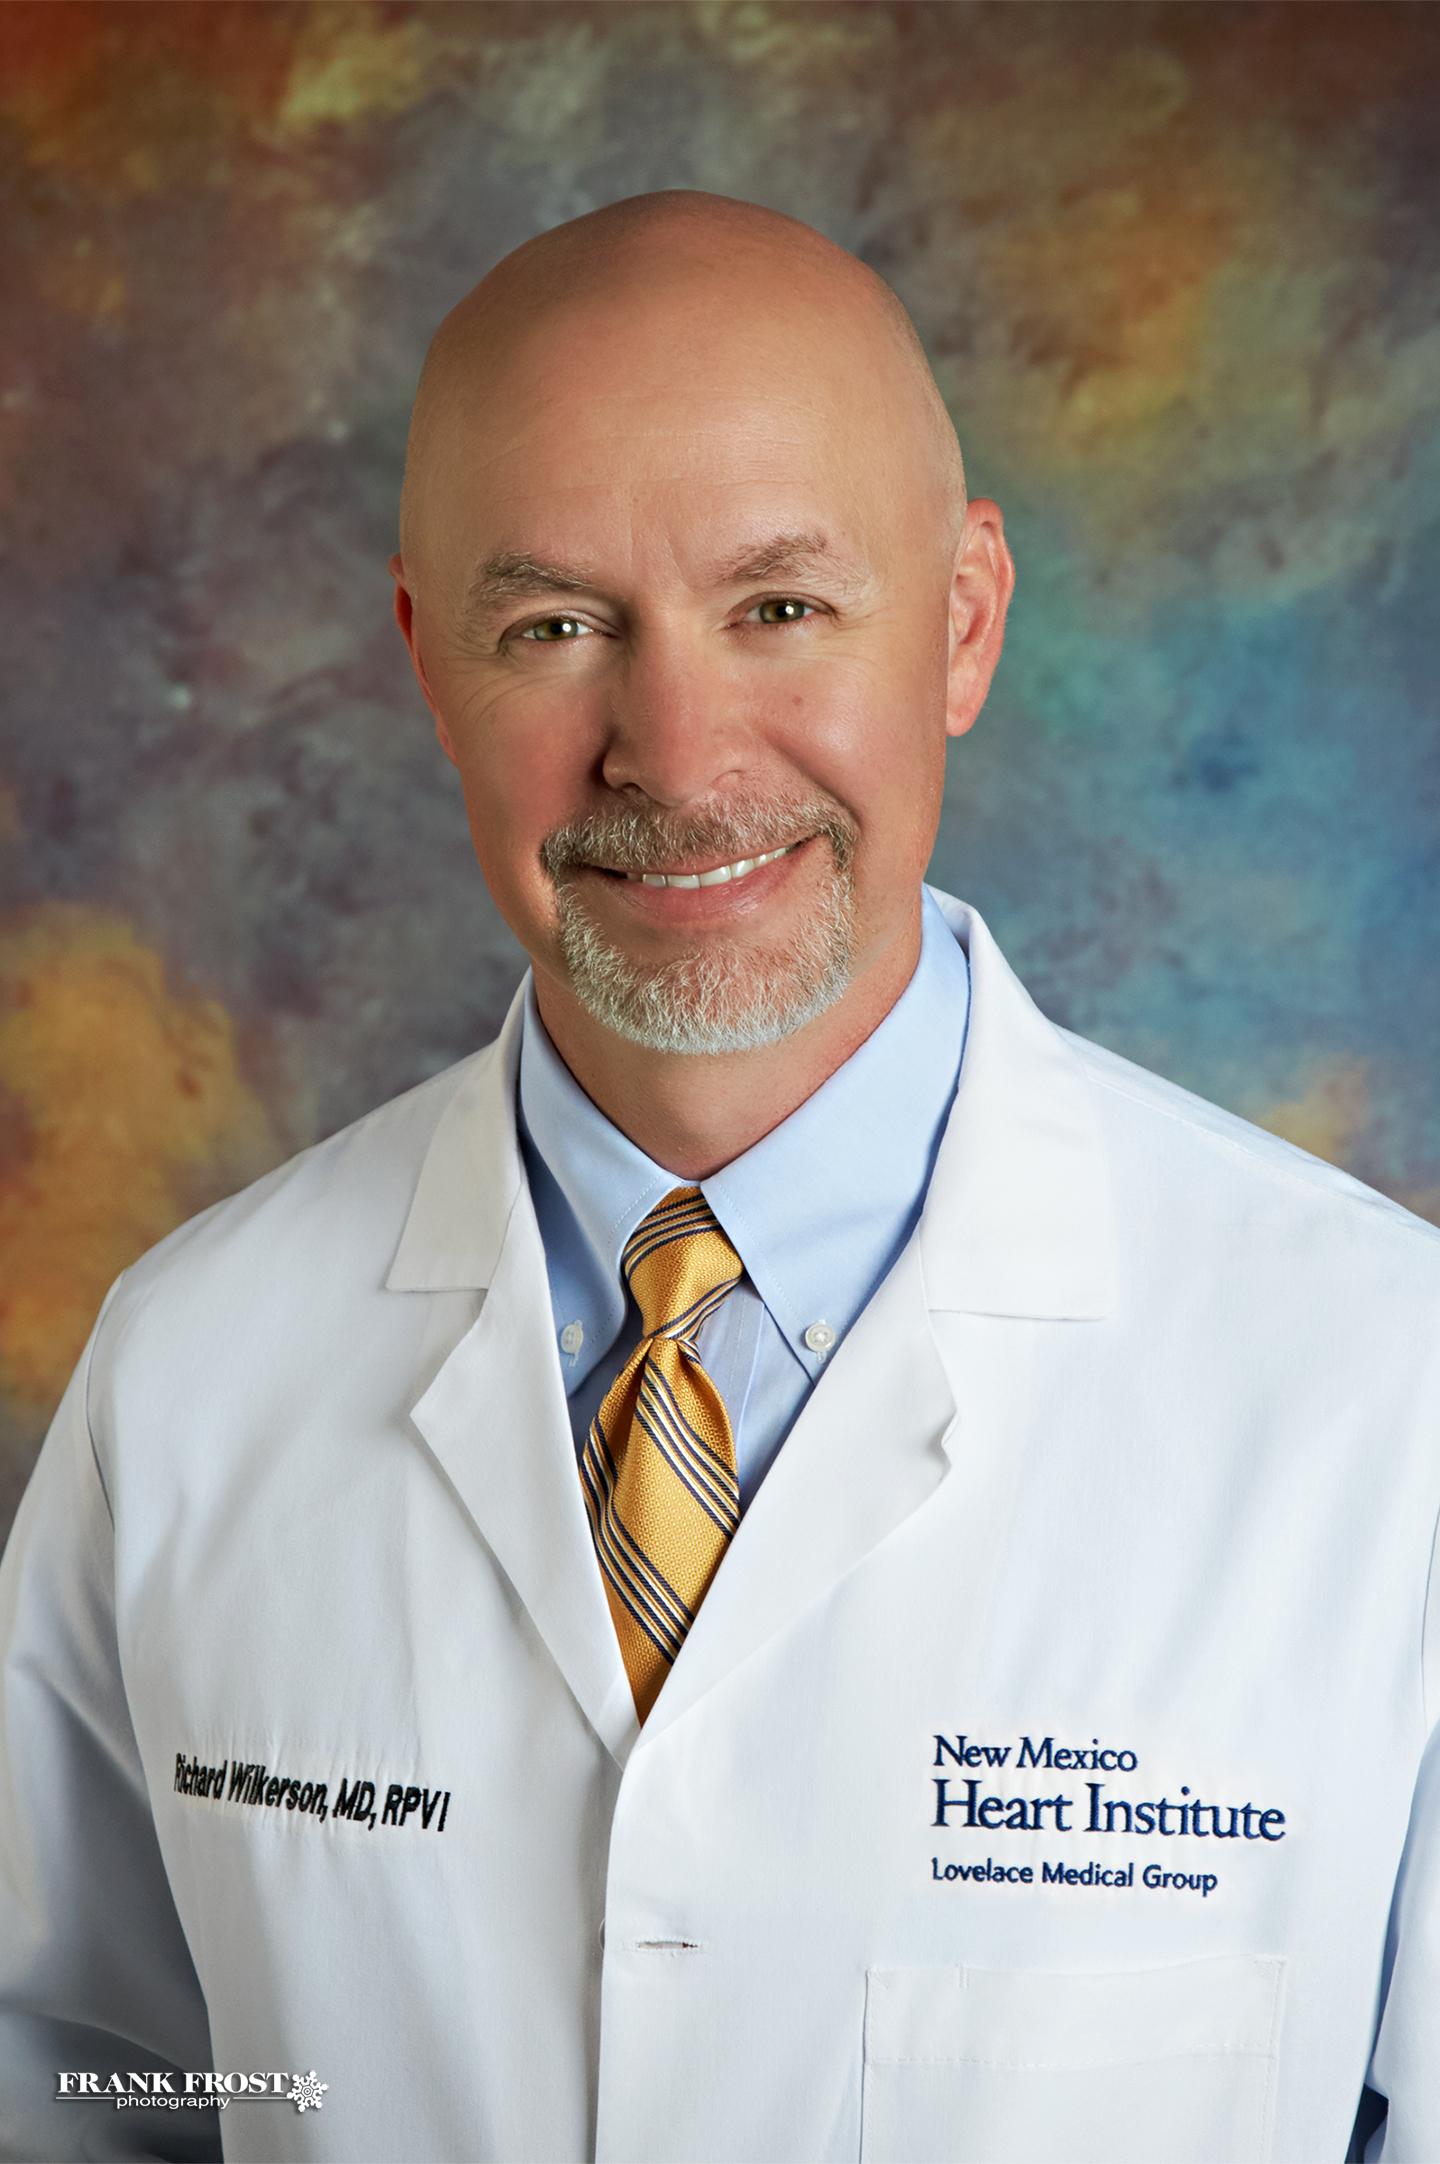 Richard Wilkerson, MD, RPVI